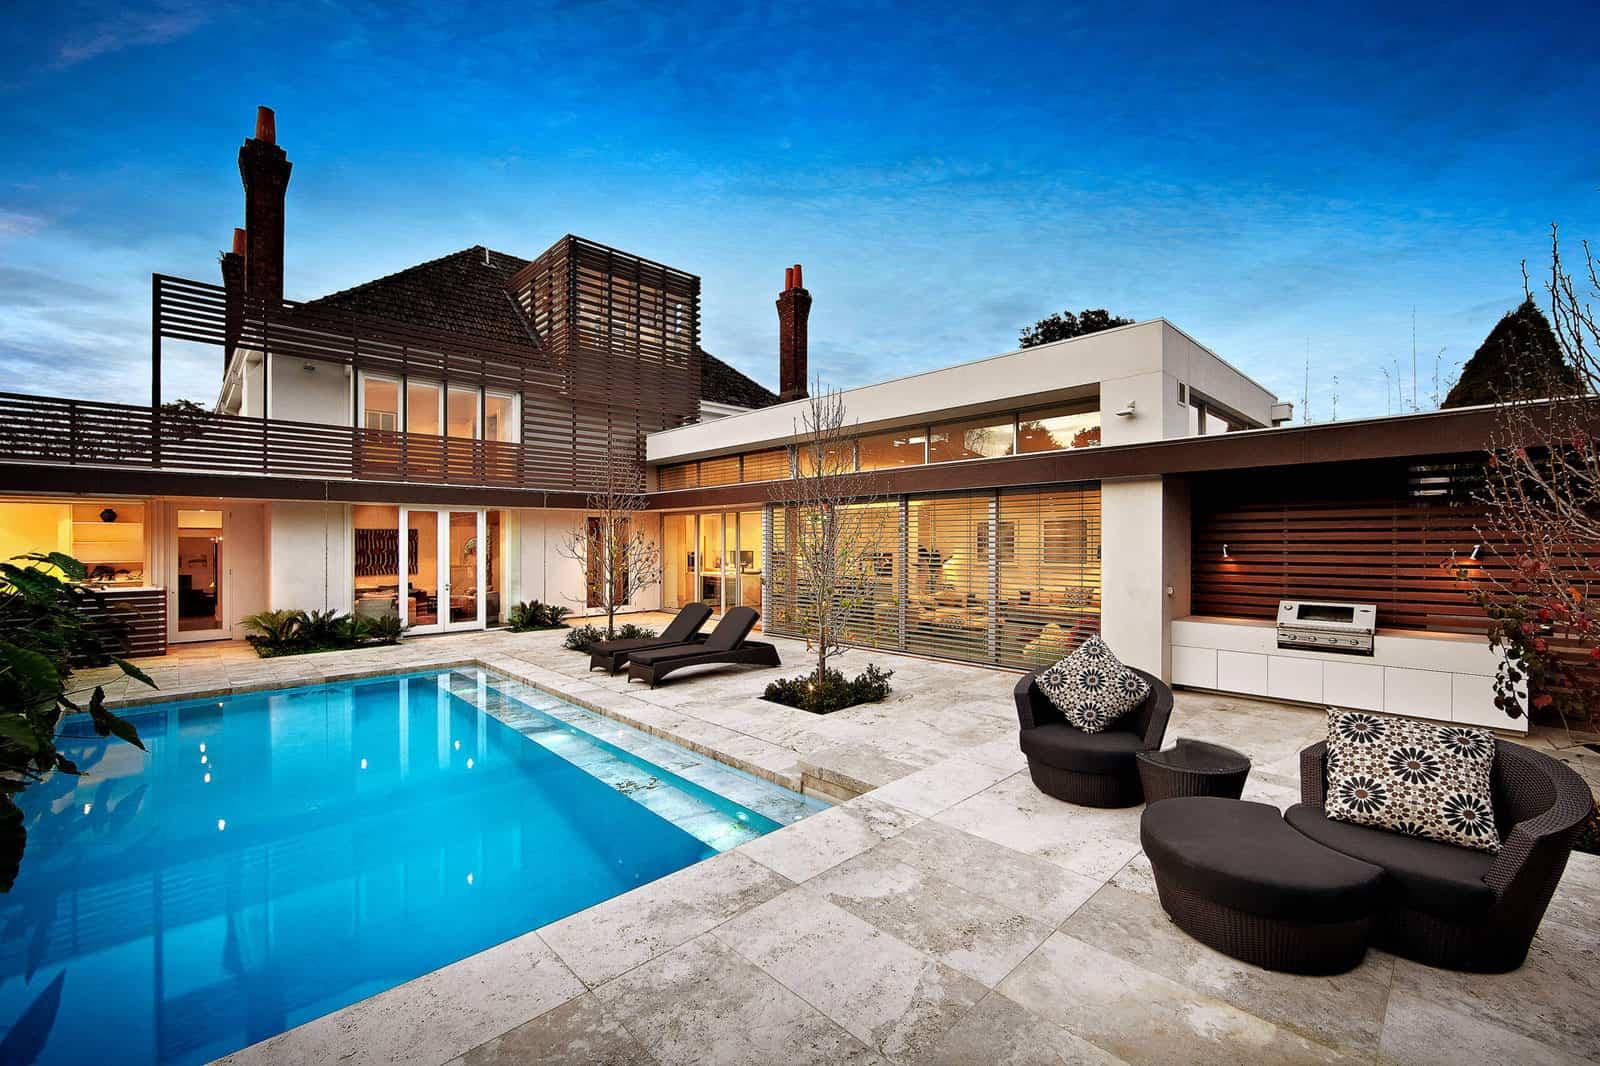 Kooyong House by Schulberg Demkiw Architects